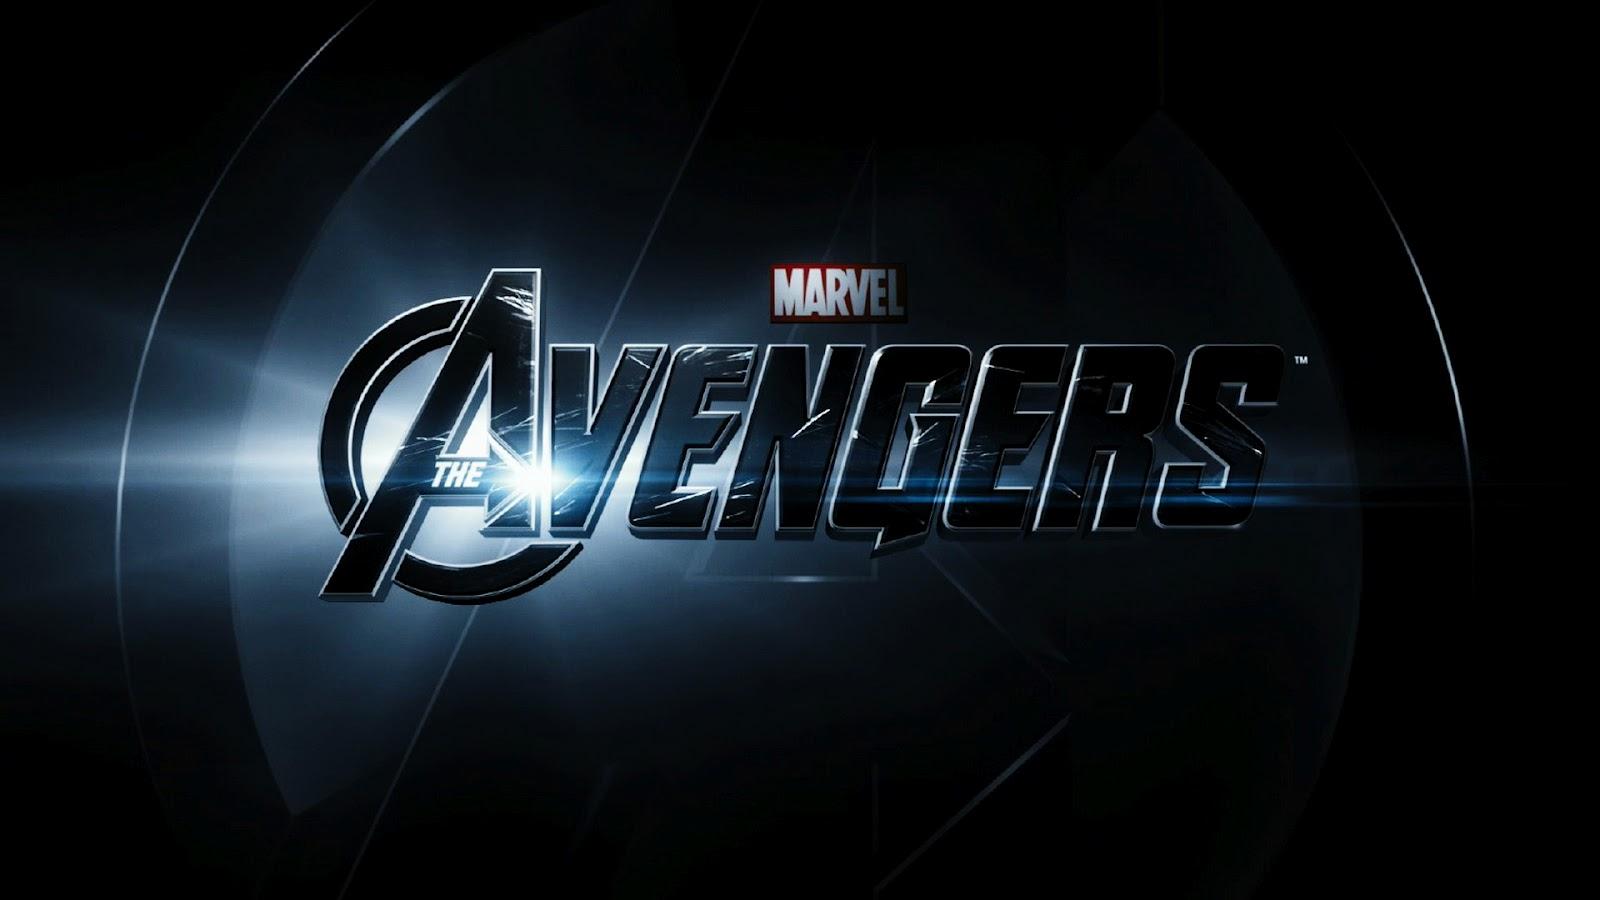 Avengers Desktop Wallpaper Marvel 1272106 Hd Wallpaper Backgrounds Download